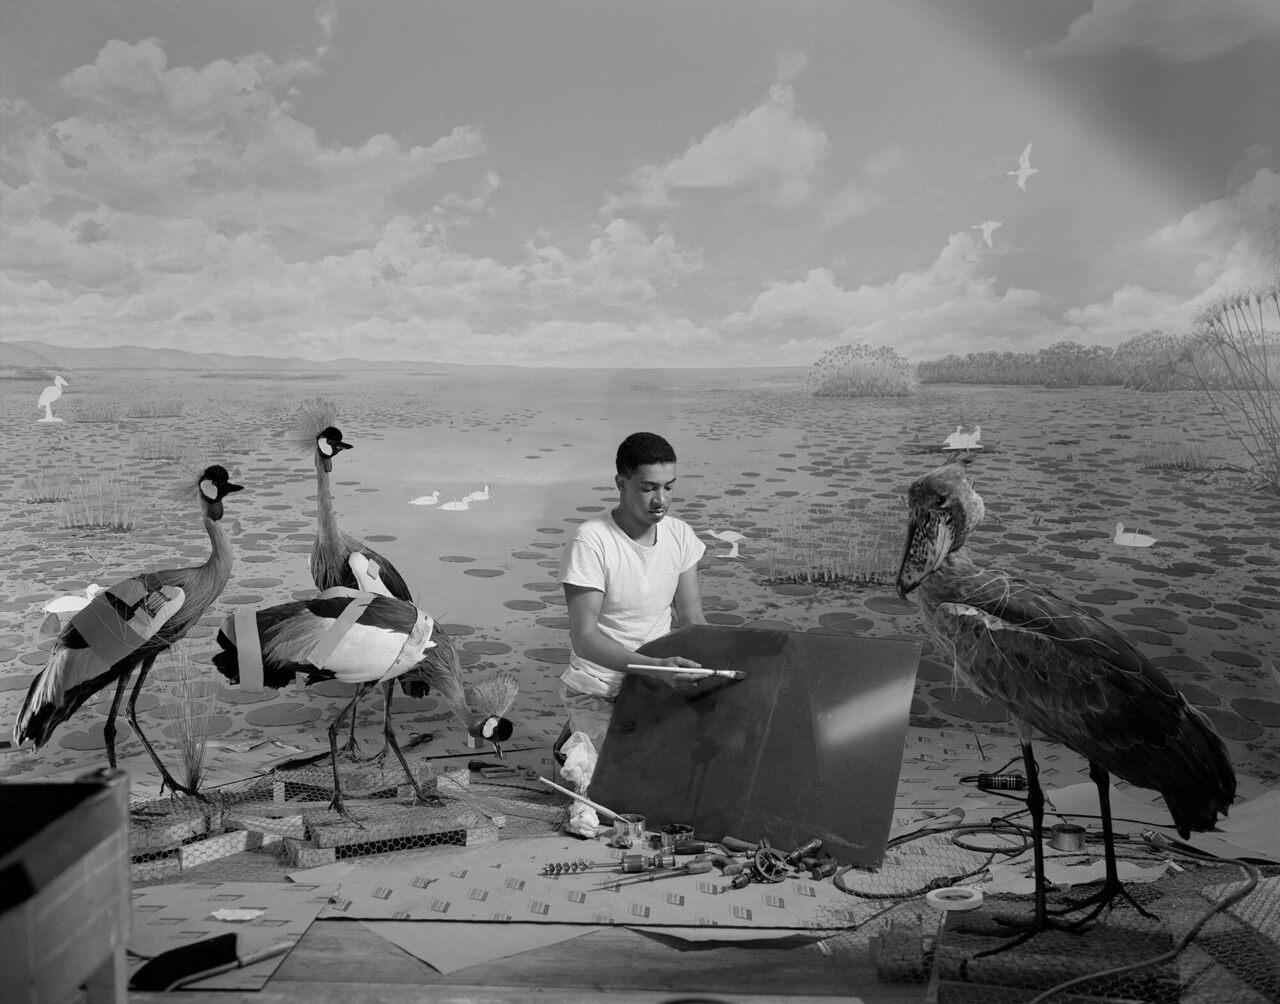 The taxidermist Carl Cotton prepares a diorama of birds in the Upper Nile.